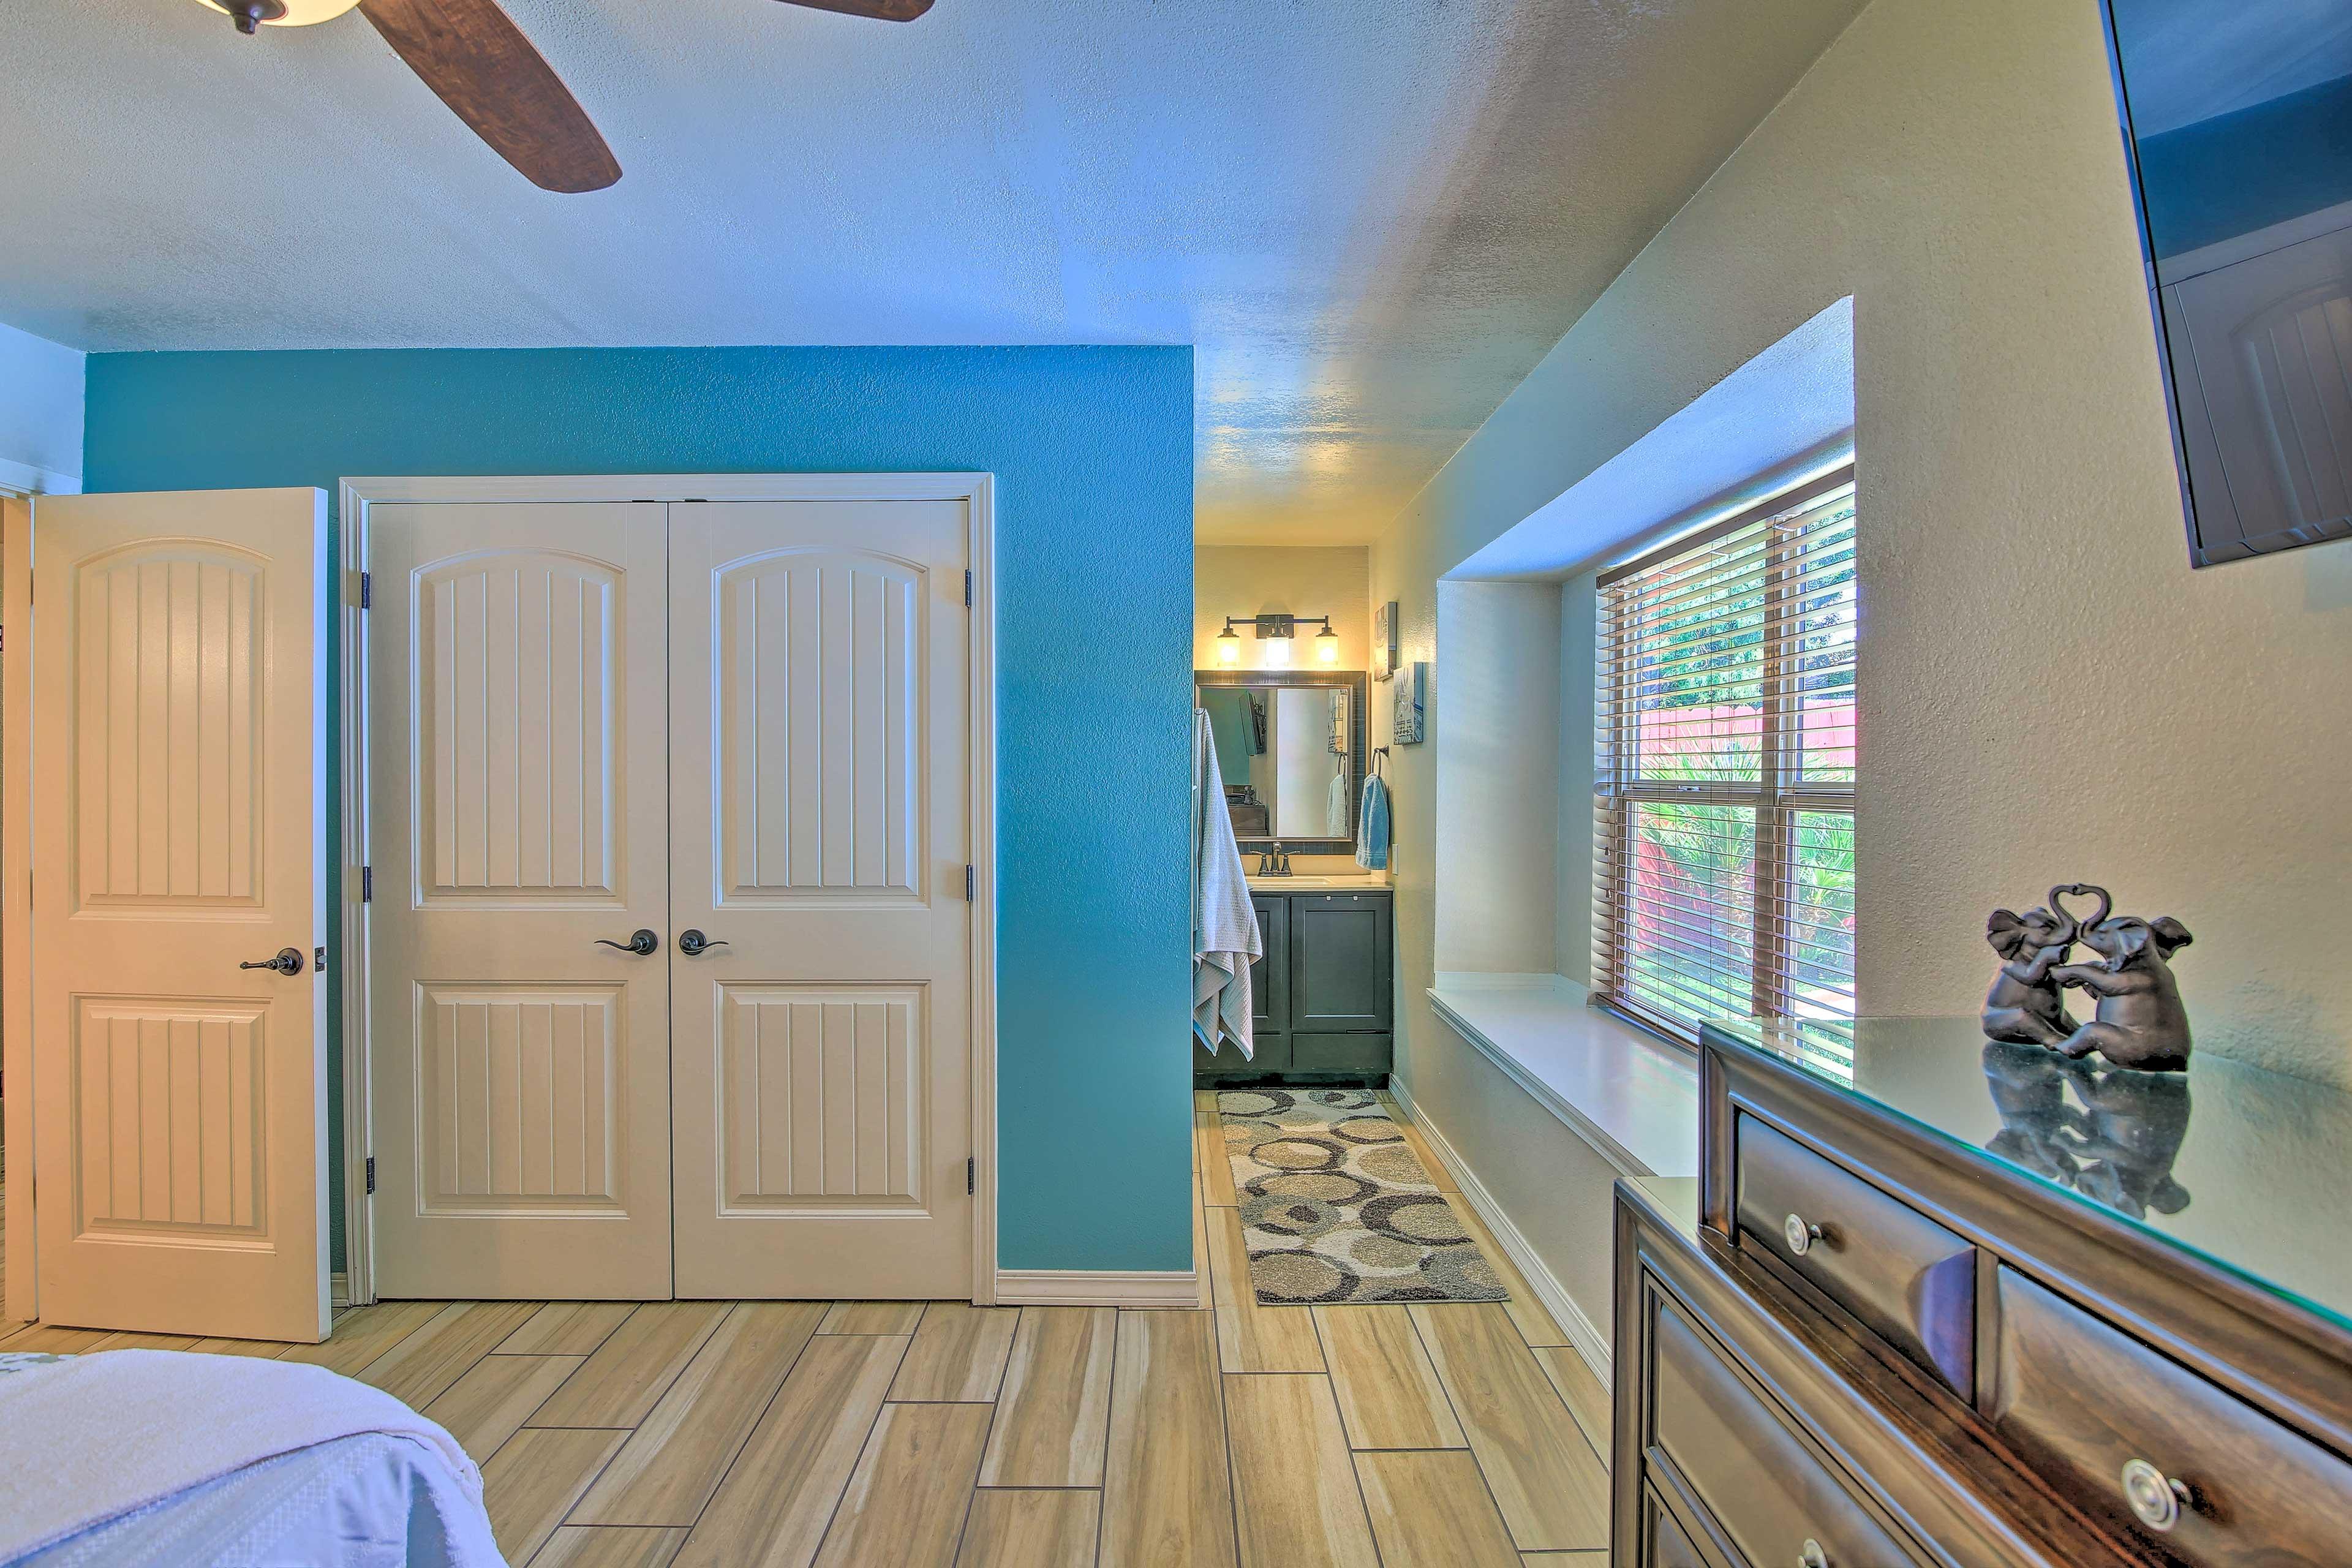 Enjoy the privacy of an en-suite bathroom.